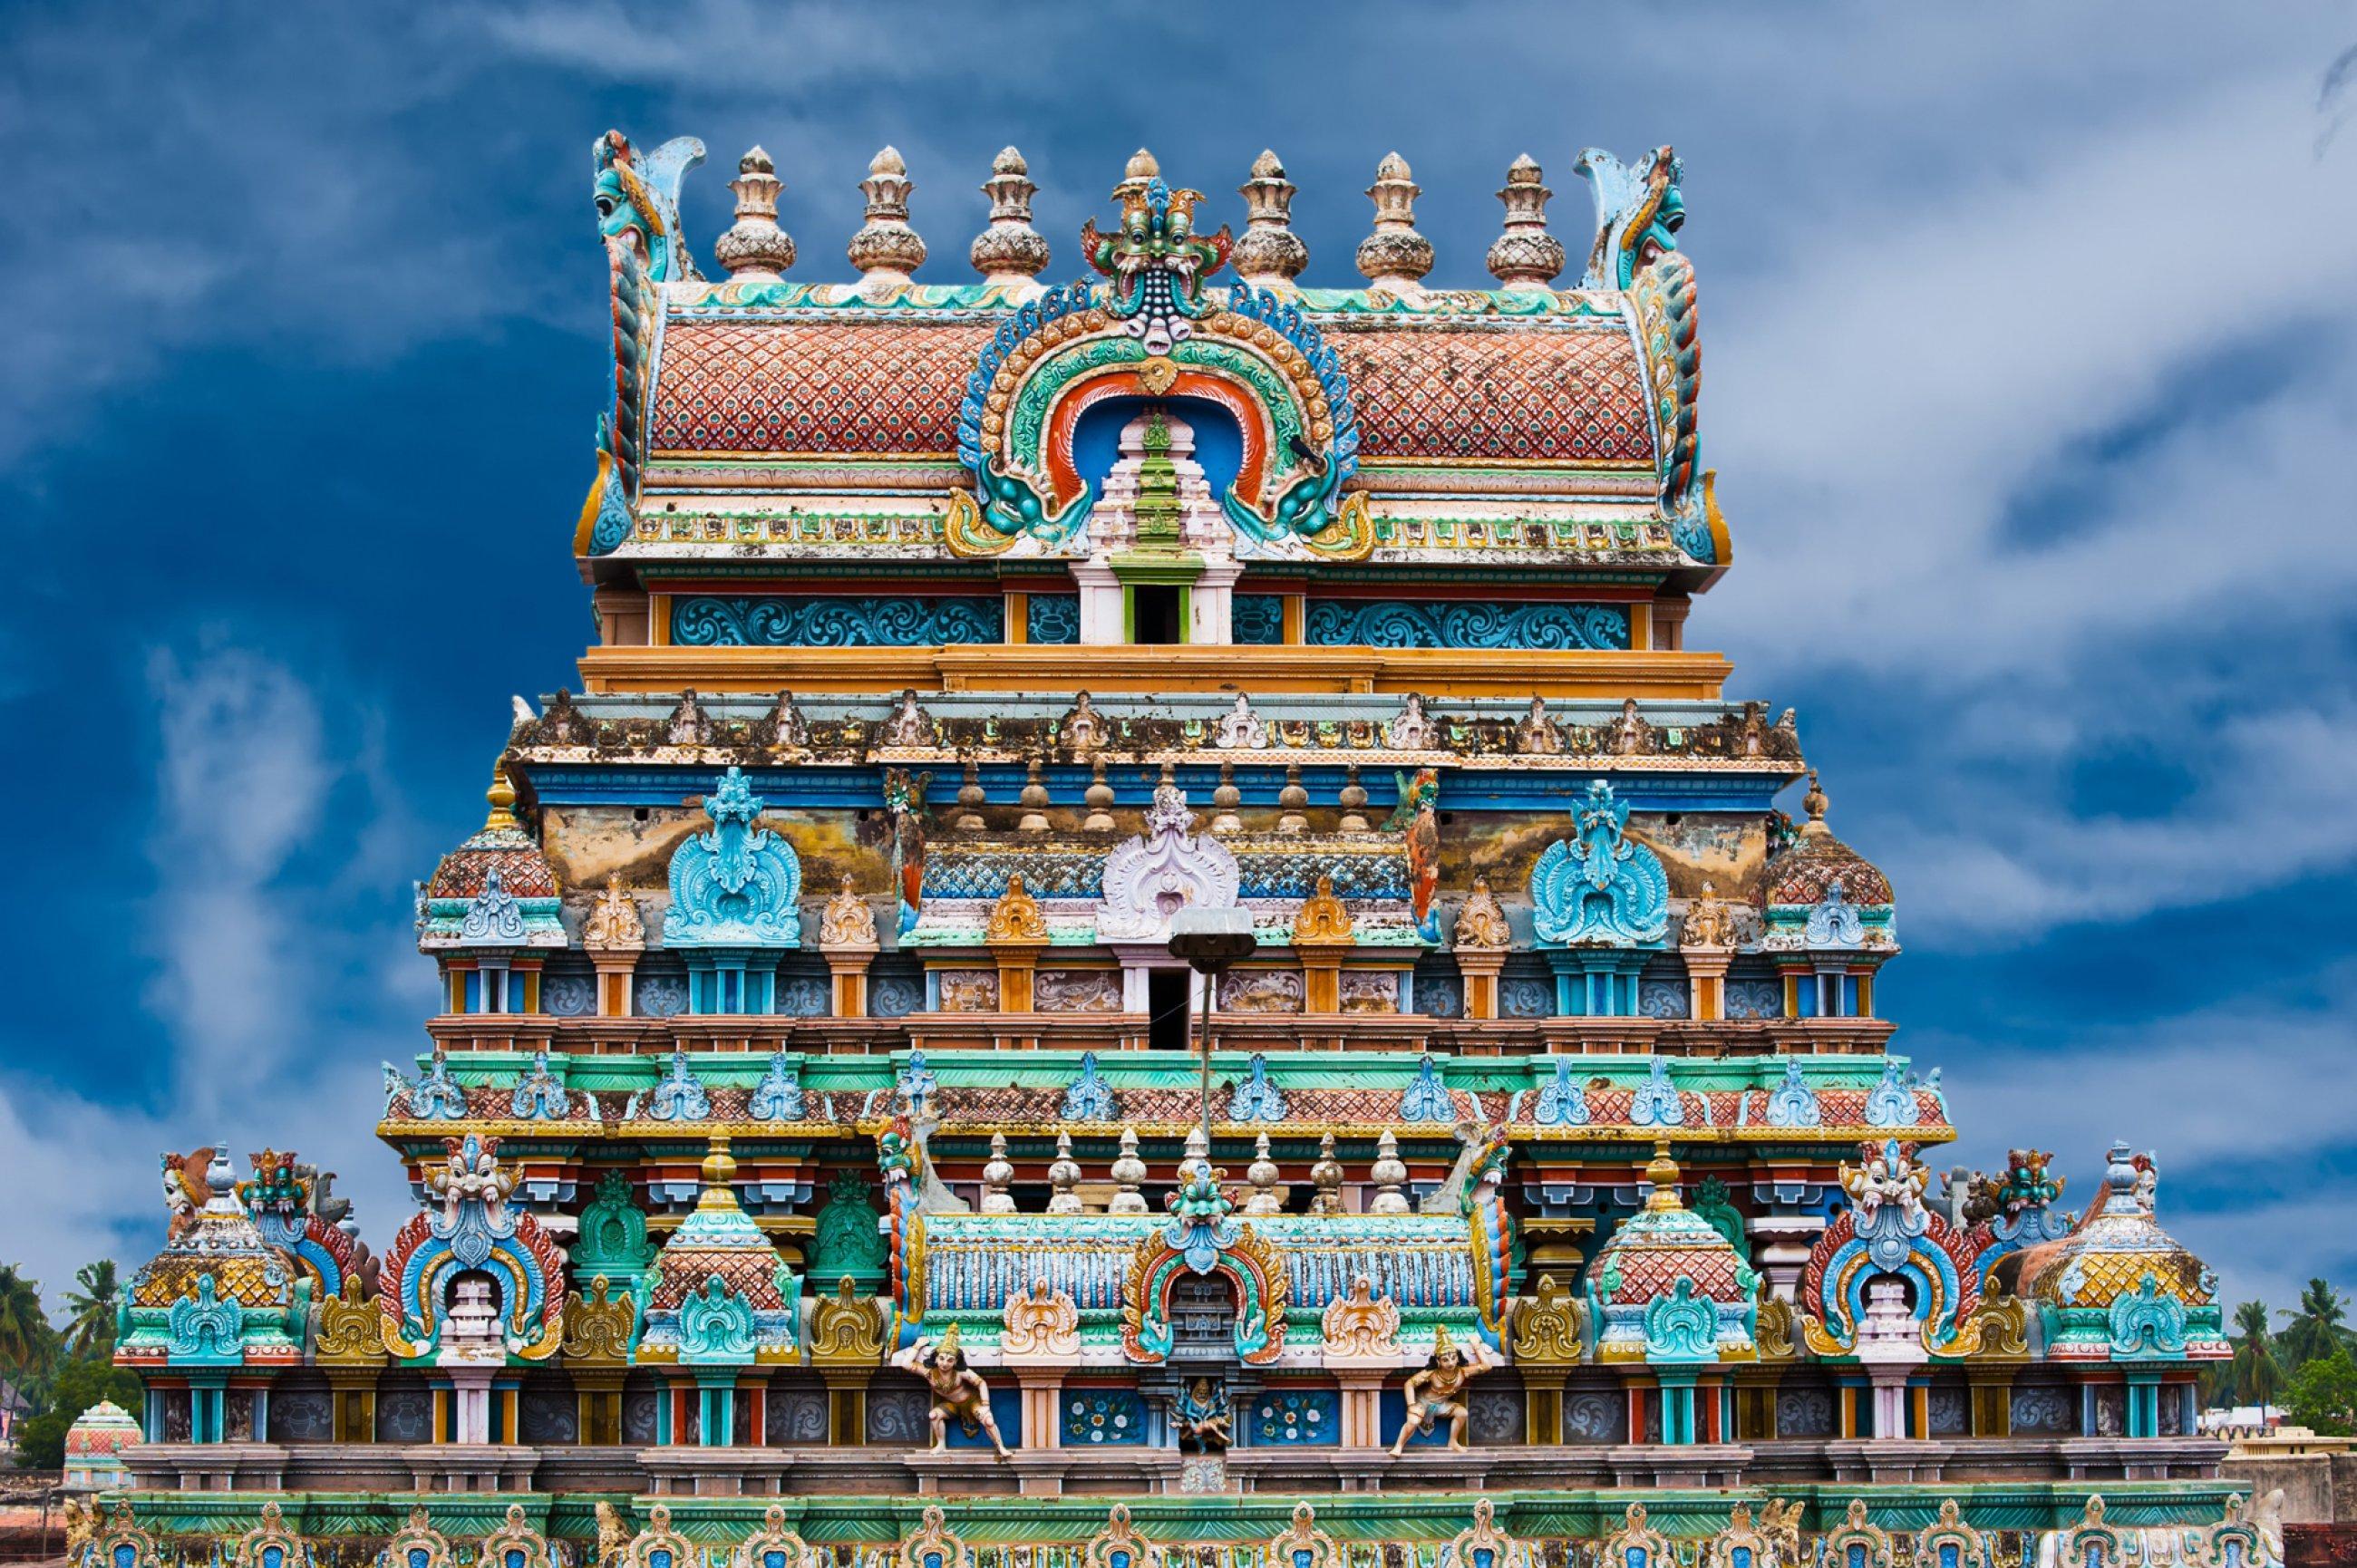 https://bubo.sk/uploads/galleries/7543/0hlavna-sri-ranganathaswamy-temple.-india-dreamstime-xl-34928463.jpg